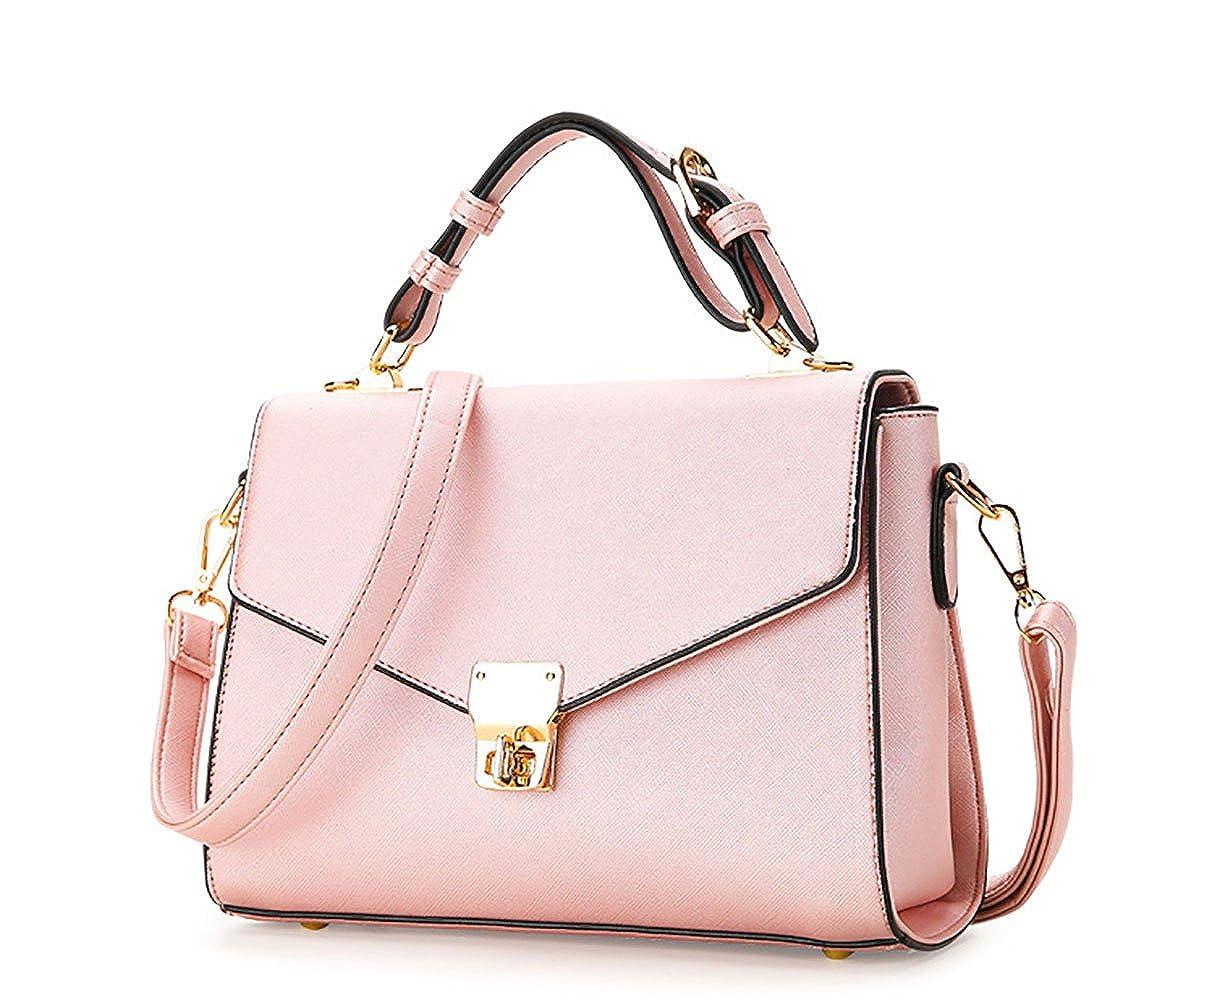 Amazon.com: haolong Lady Bolso bolsa Mochila Ocio bolsa de ...